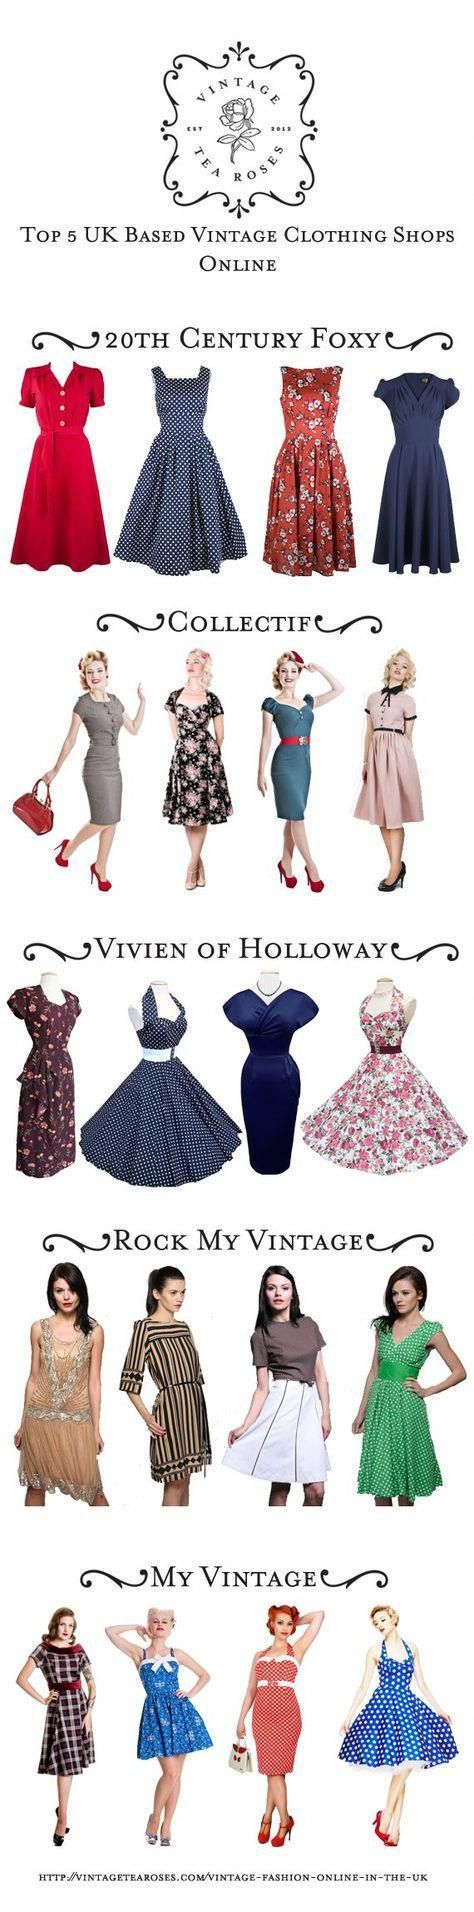 Women S Fashion Worldwide Shipping Womensfashionfromthe60s Ewomenfashion Vintage Clothes Shop Vintage Fashion Online Vintage Outfits